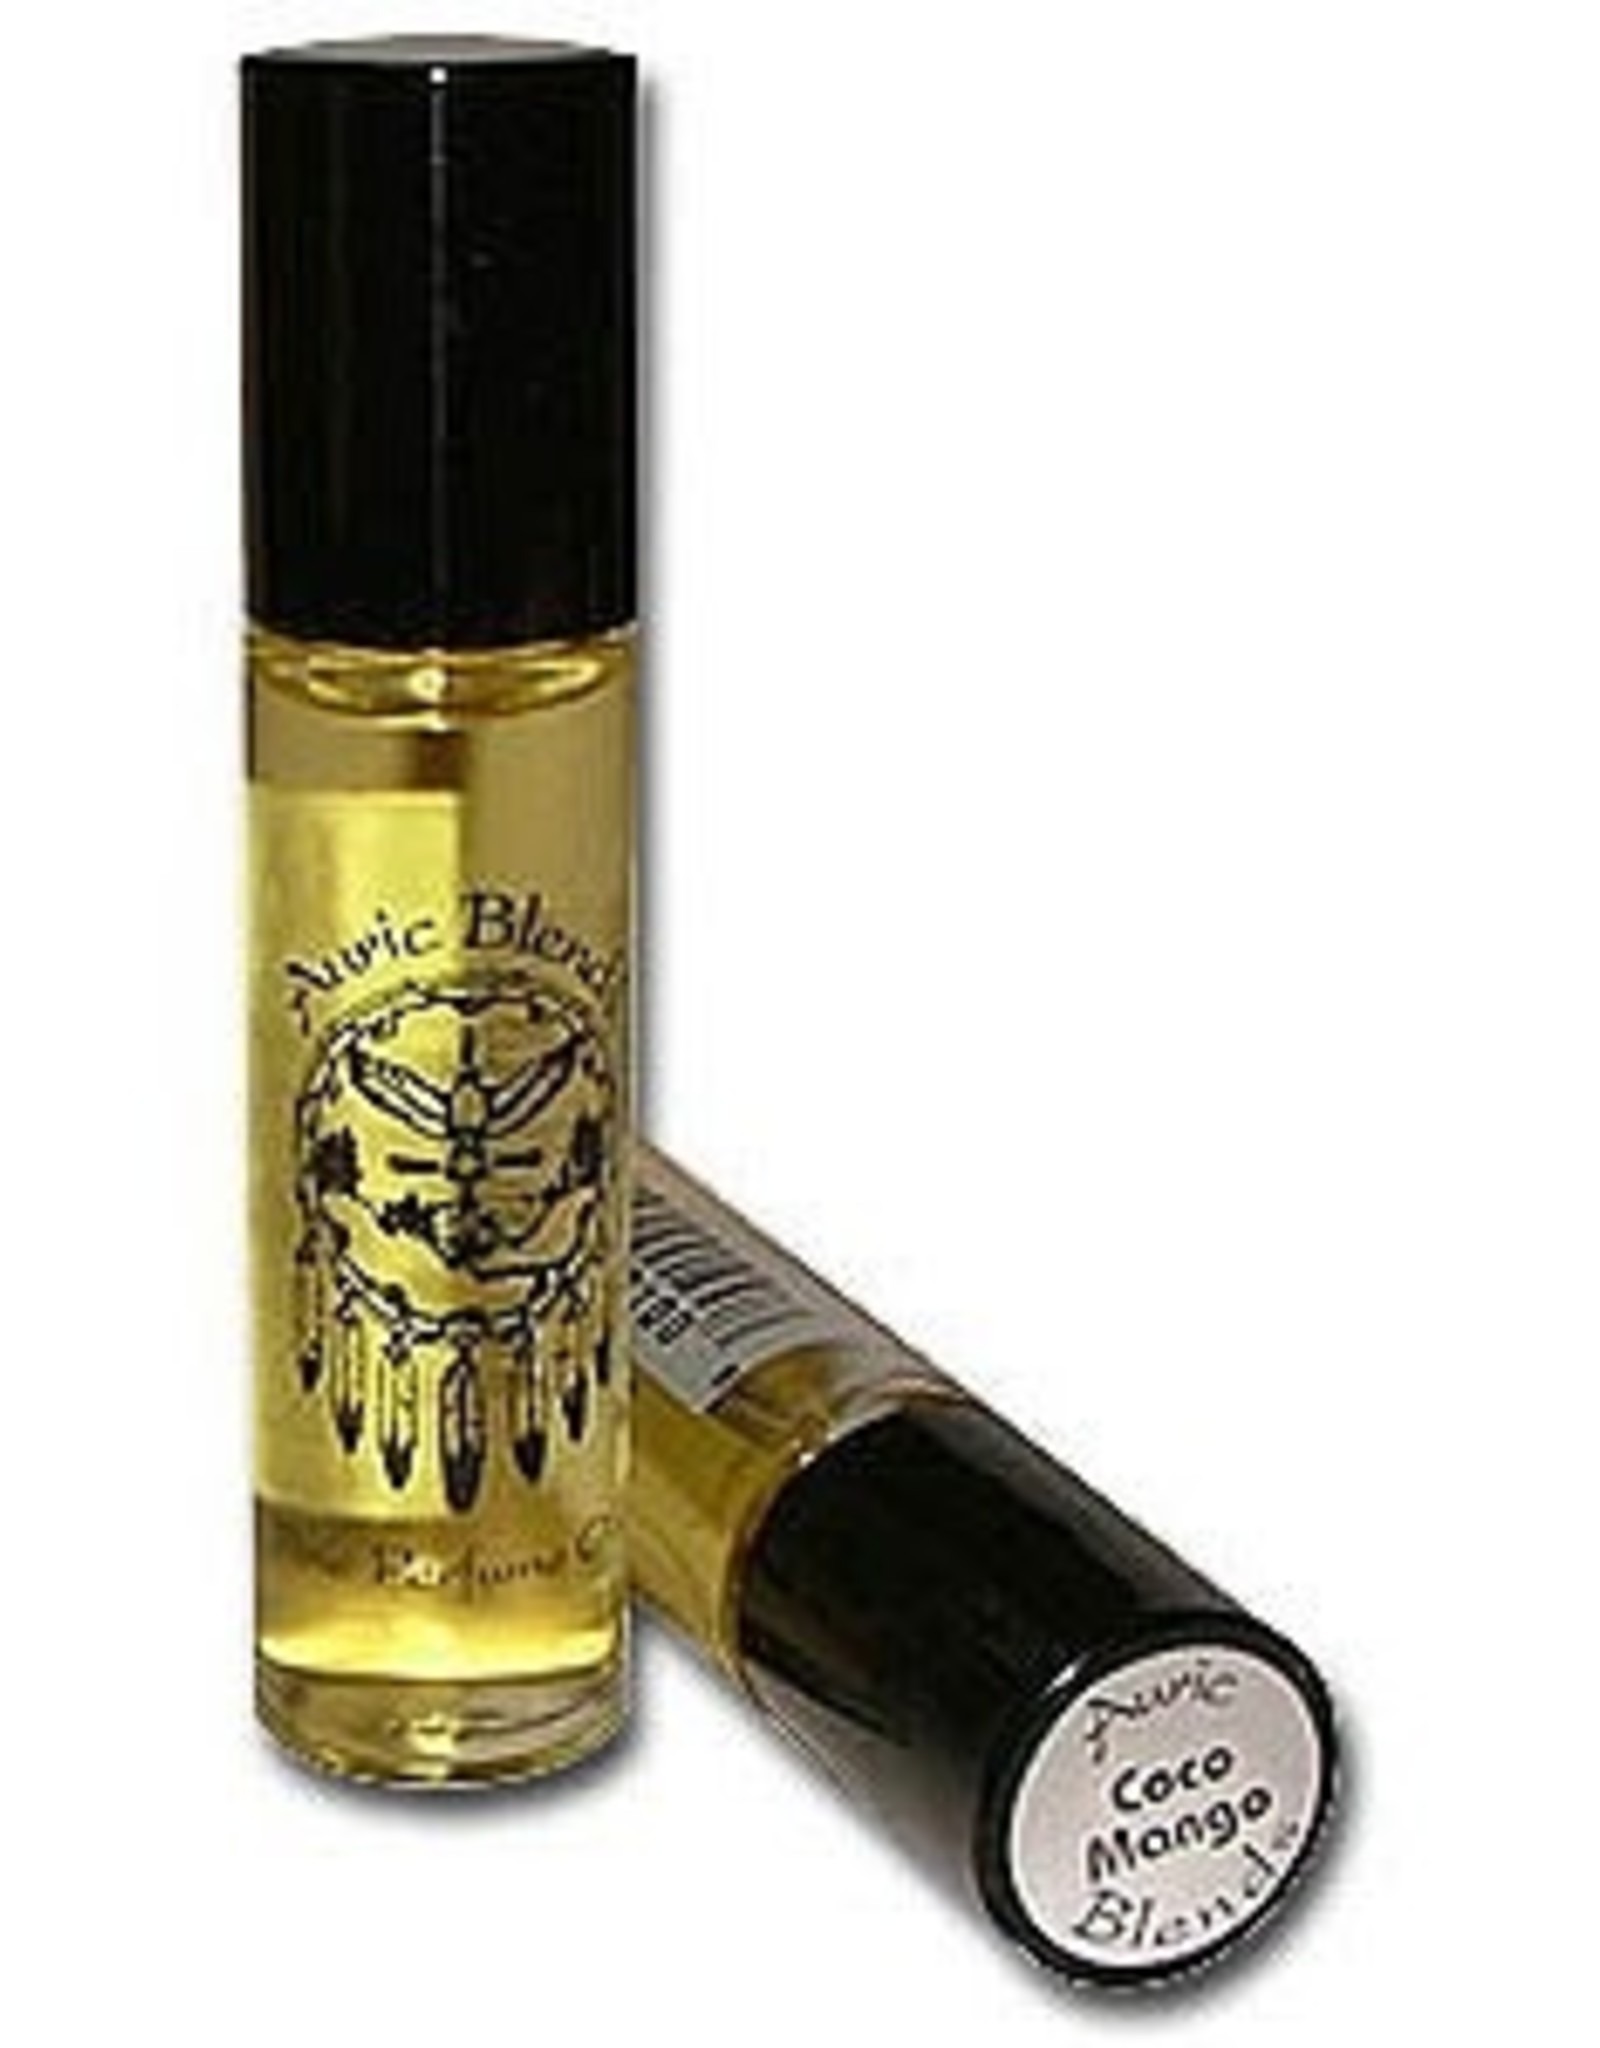 Auric Blends Coco Mango Auric Blends Roll-on Oil